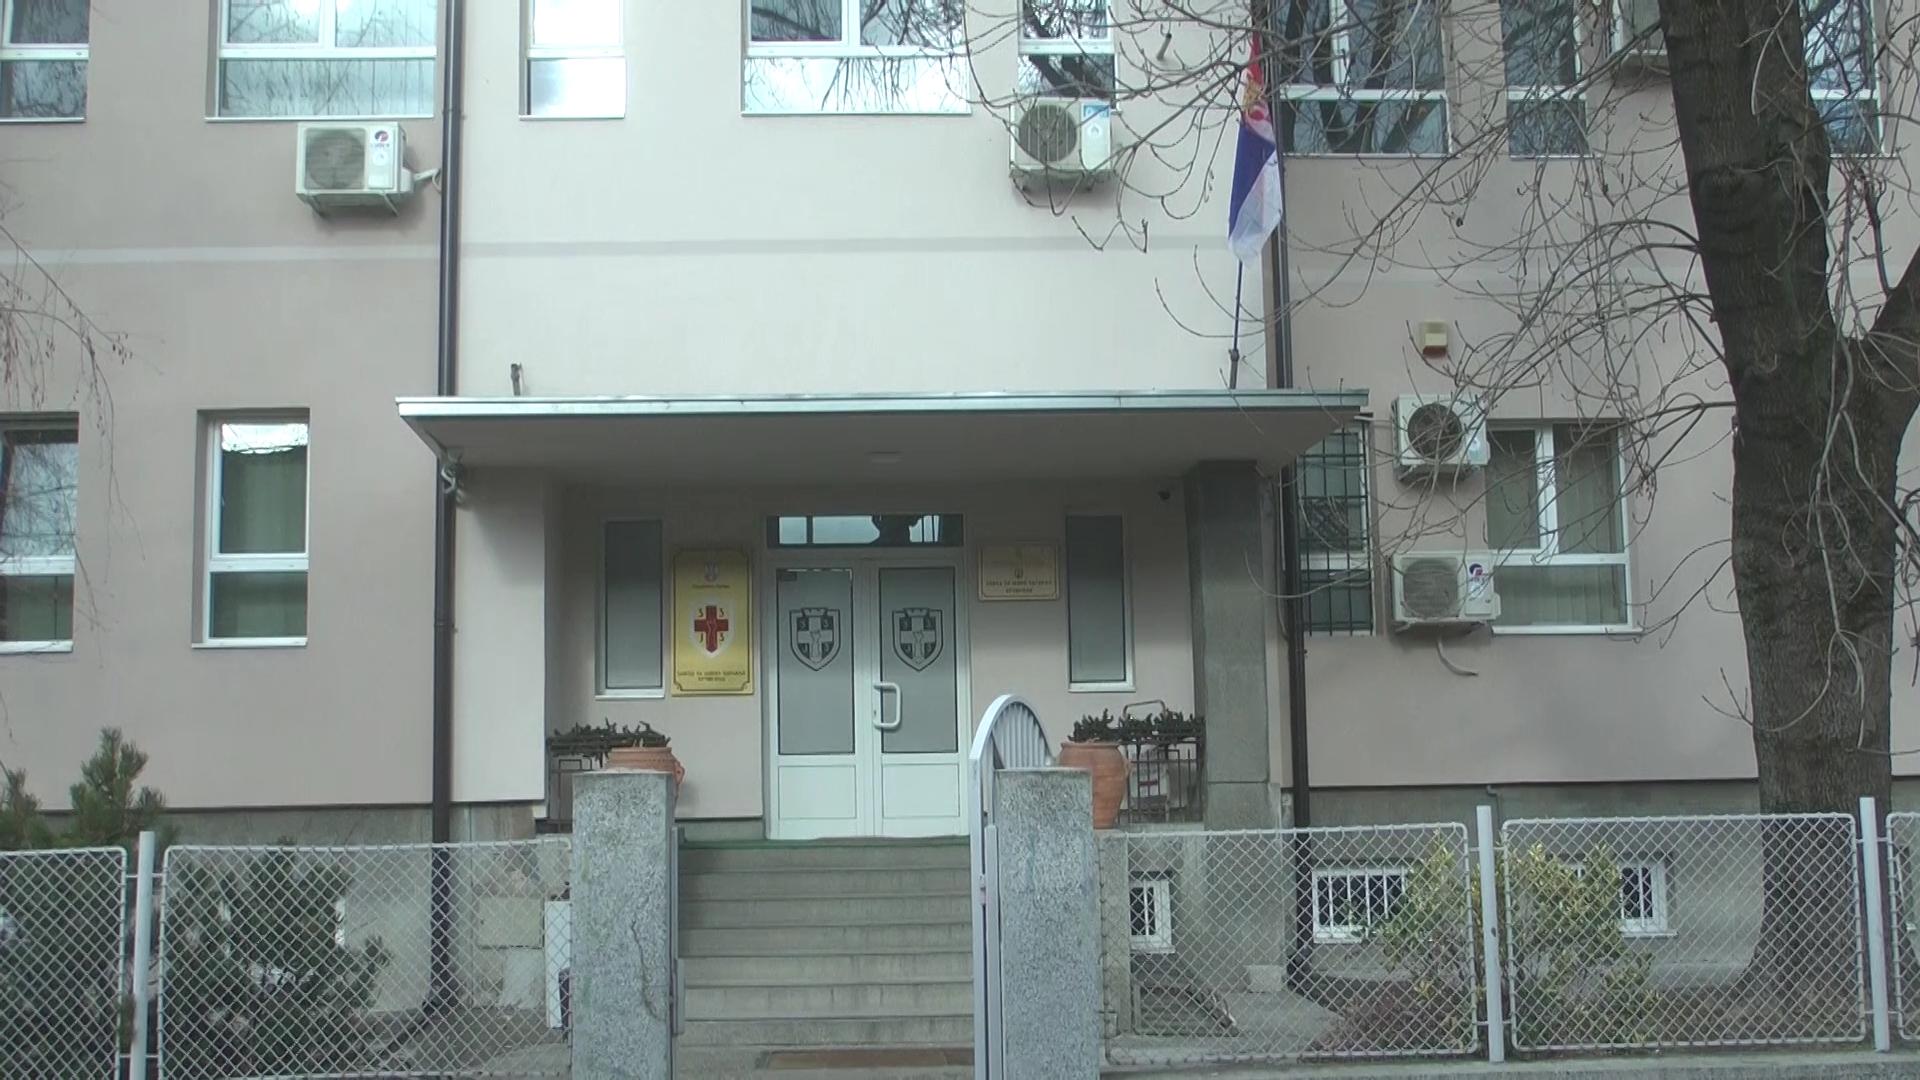 Preminula ženska osoba iz Varvarina od KOVID-a 19